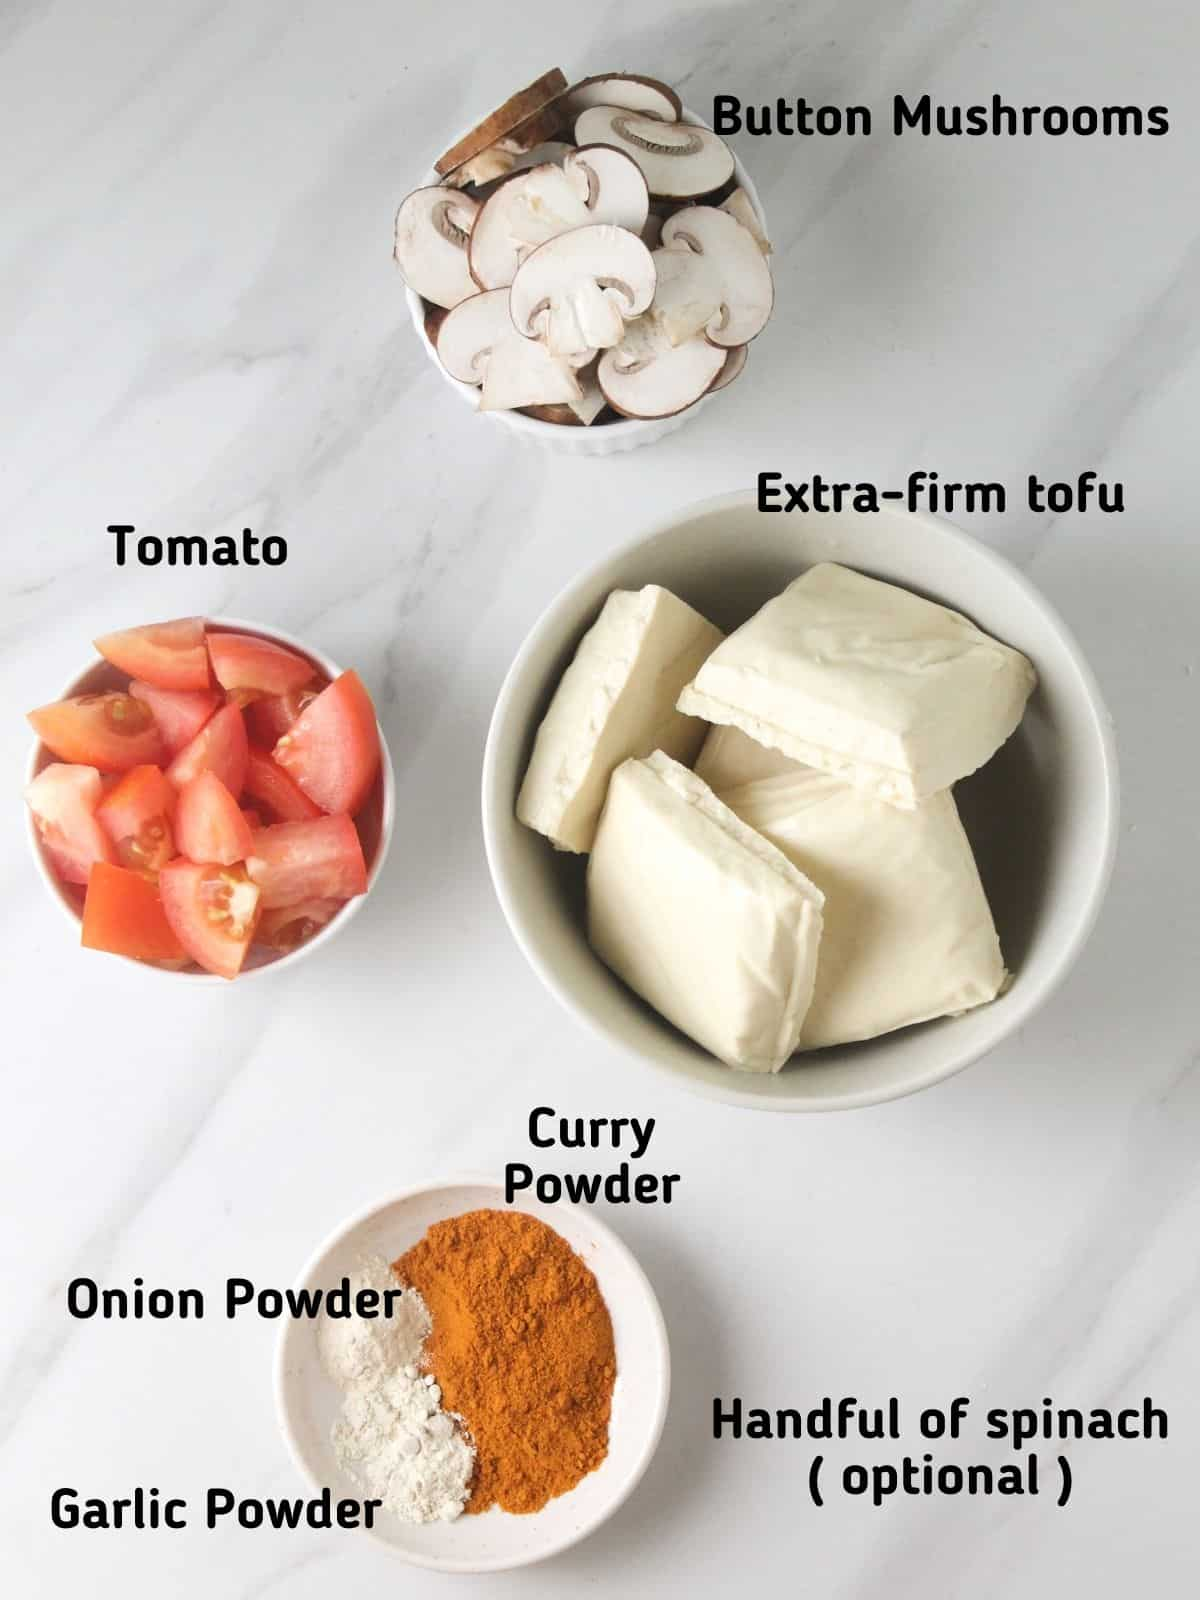 Ingredients needed like mushroom, tomato, tofu, curry powder, onion powder and garlic powder.